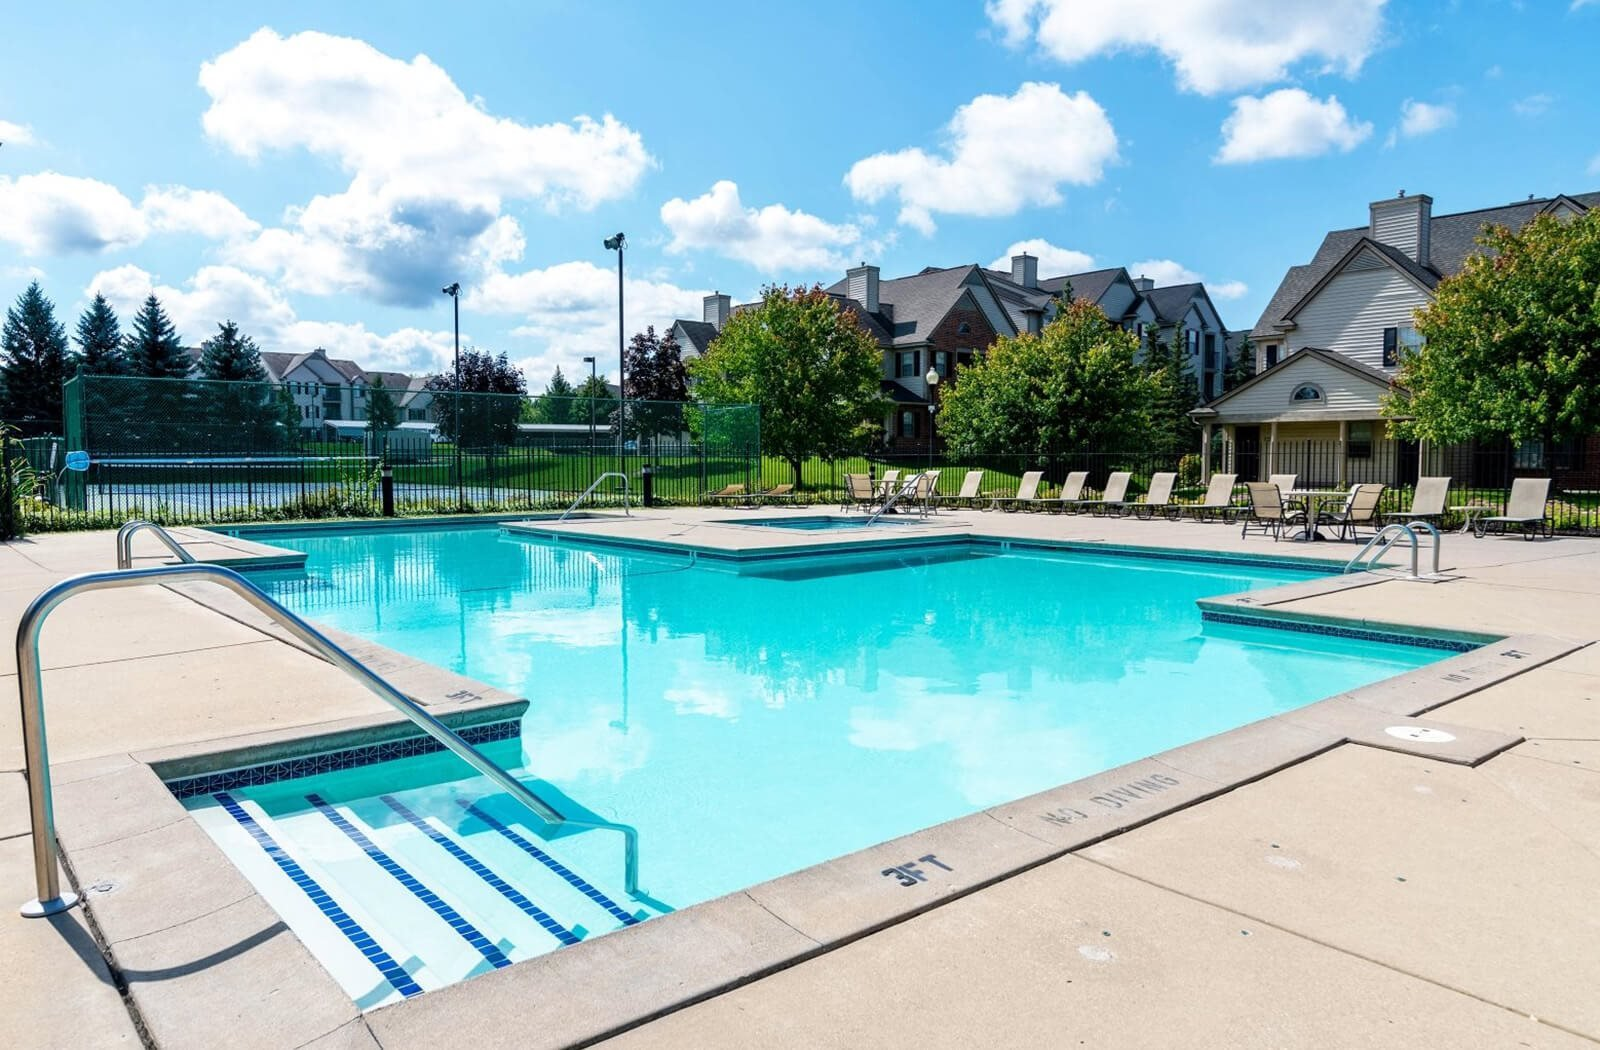 River Oaks Apartments in Kentwood, MI